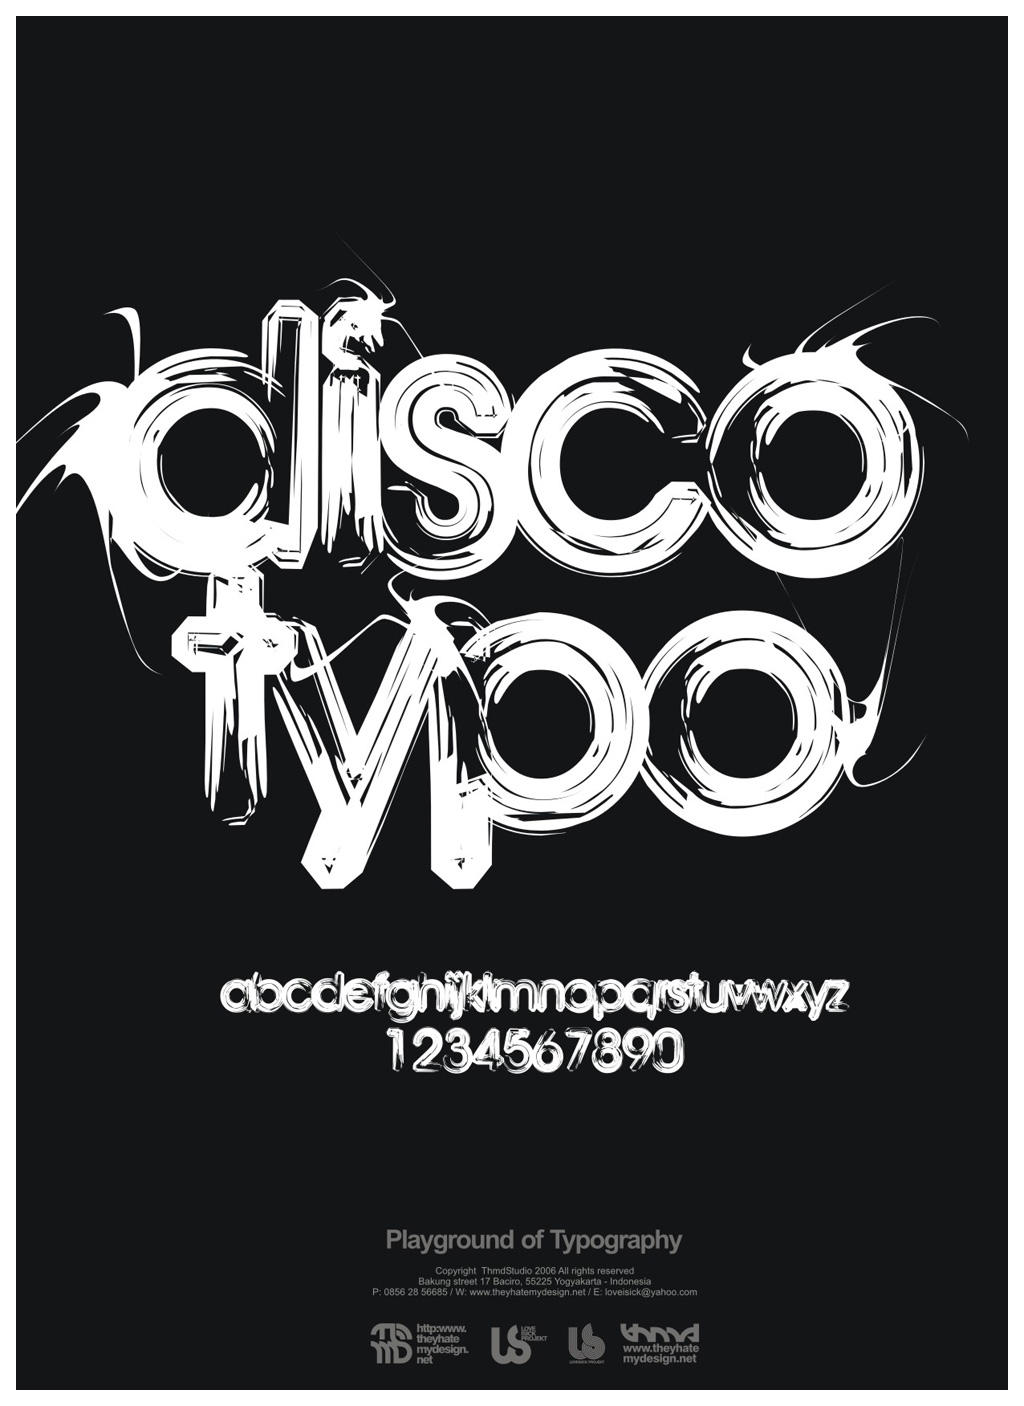 playground of typography by loveisickprojekt